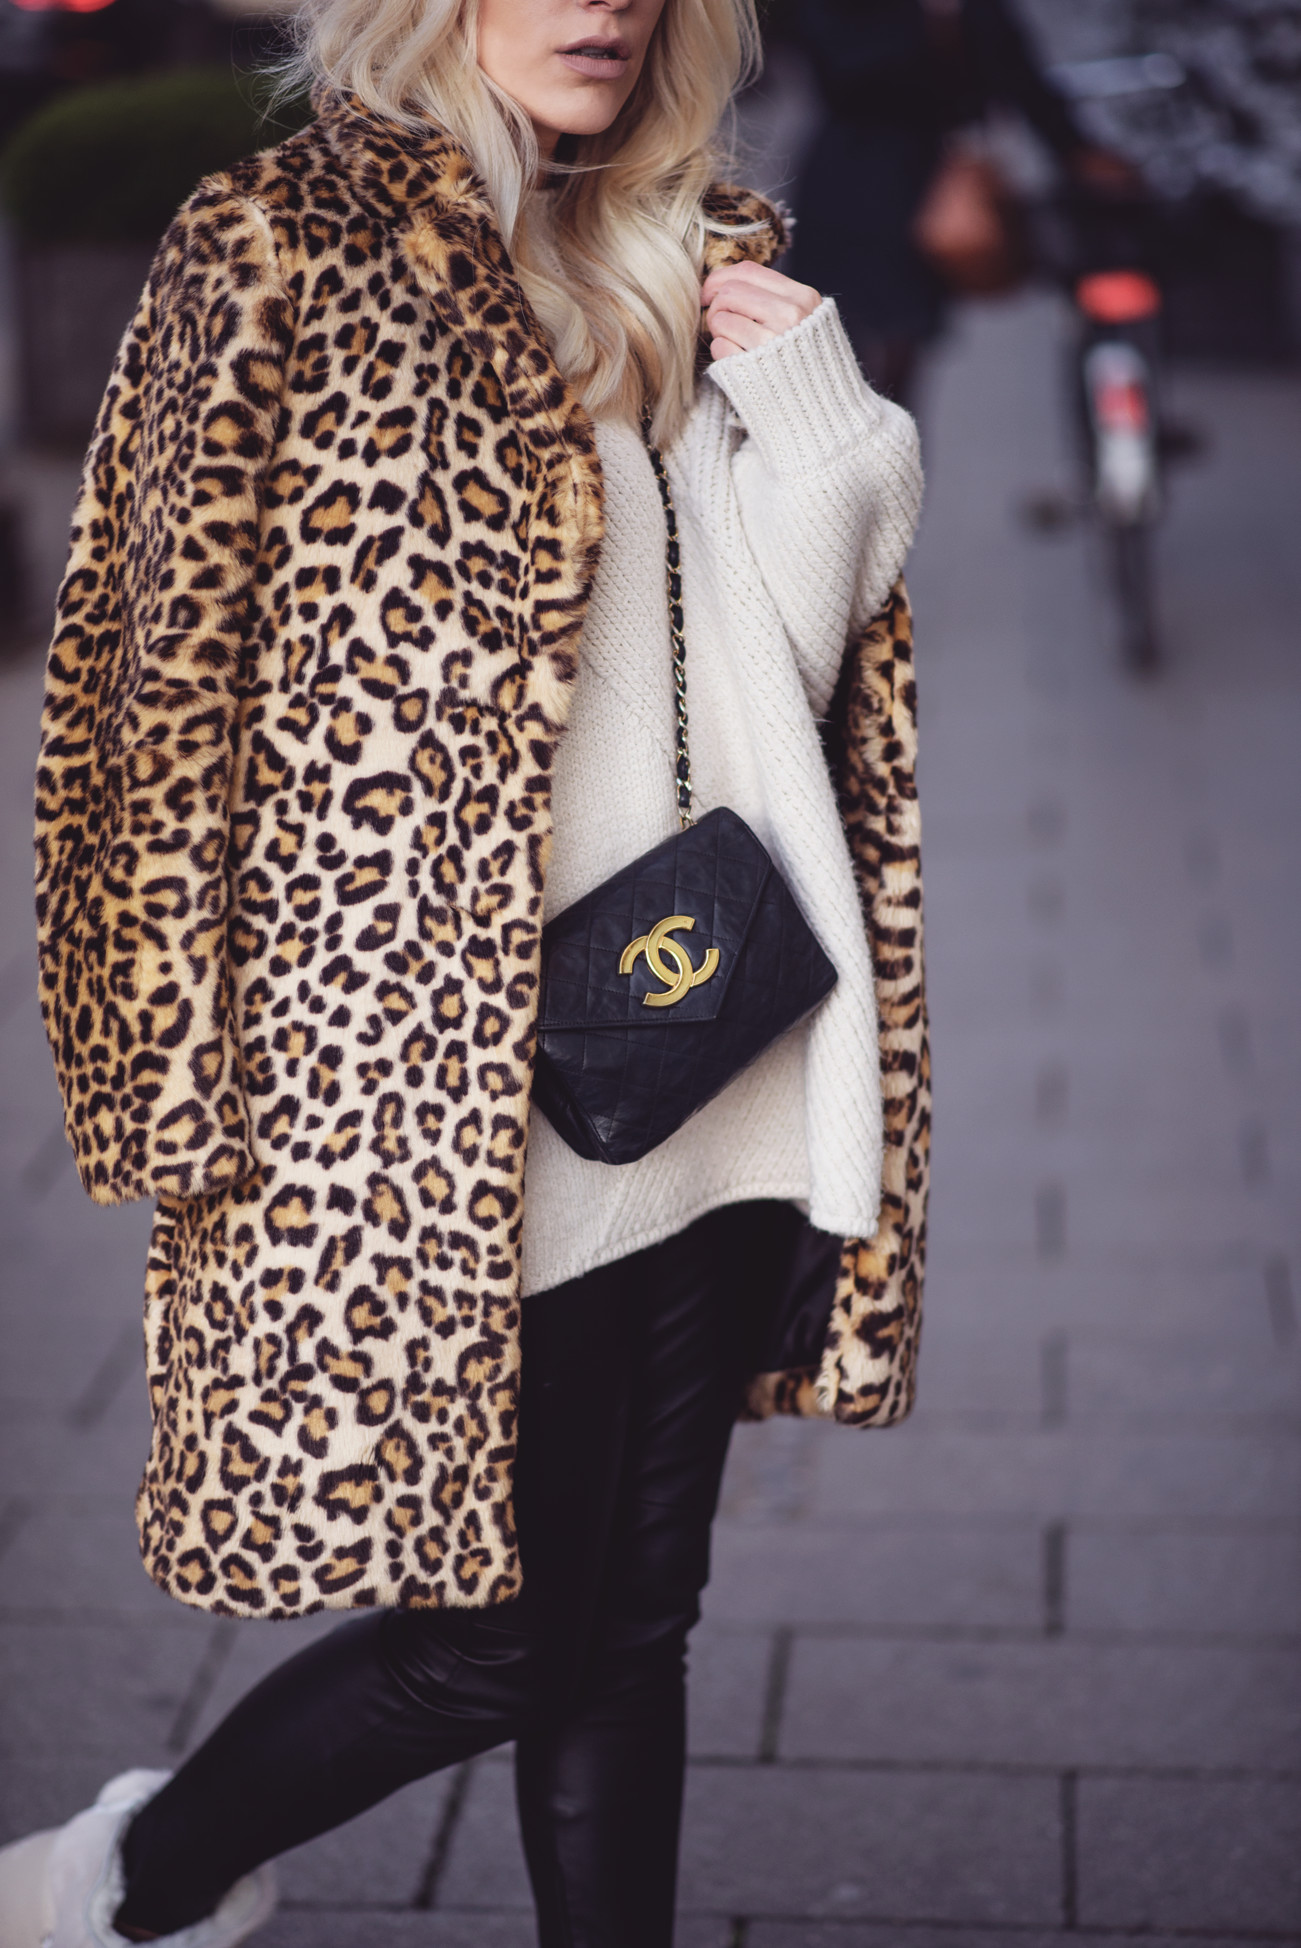 fashion-fashionblogger-blogger-chanel-winter-cozy-knitwear-leo-sequinsophia-4-dsc_6183